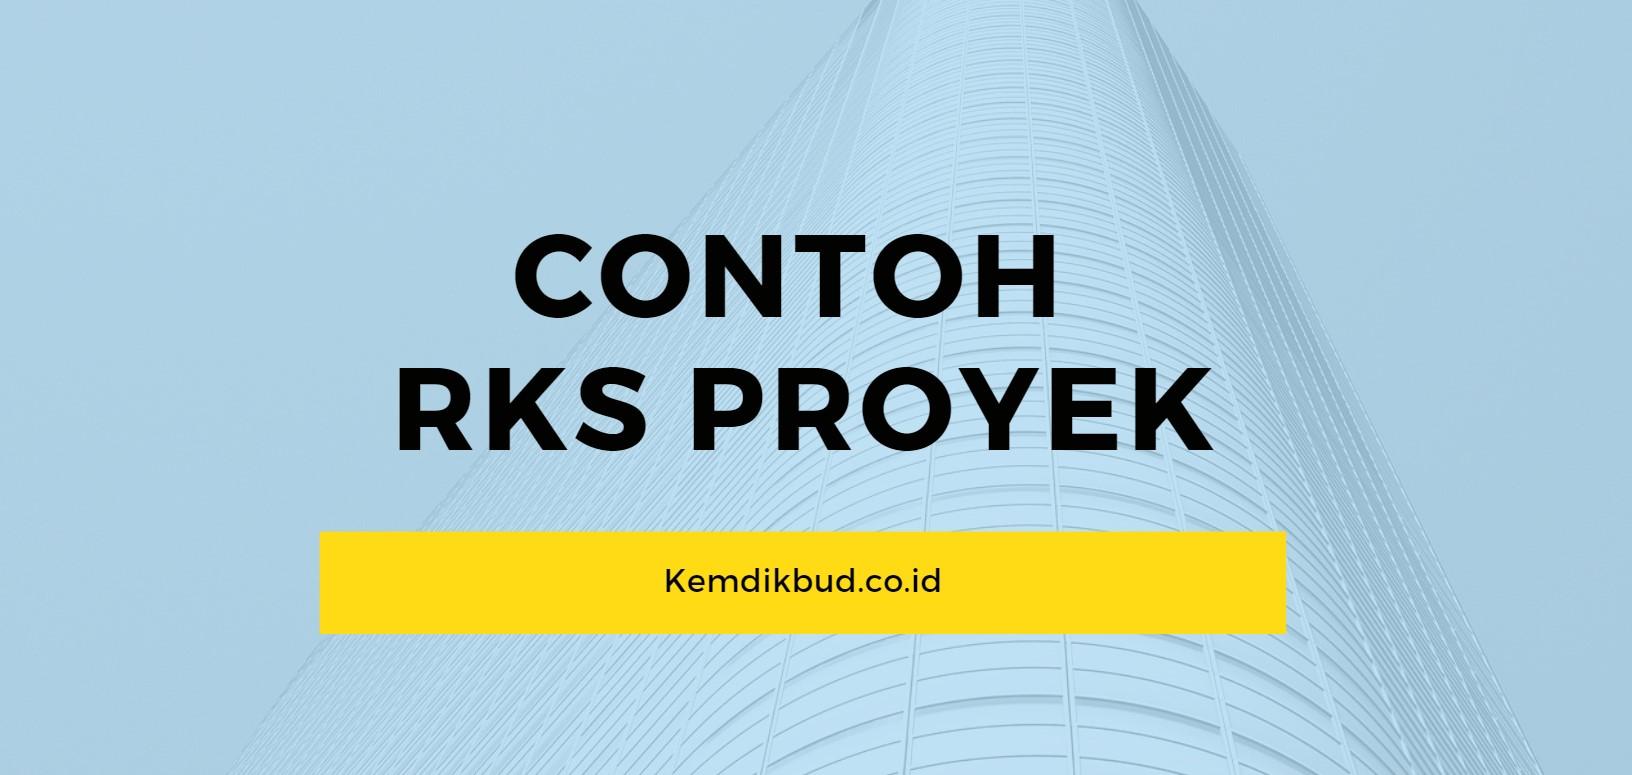 contoh dokumen rks proyek